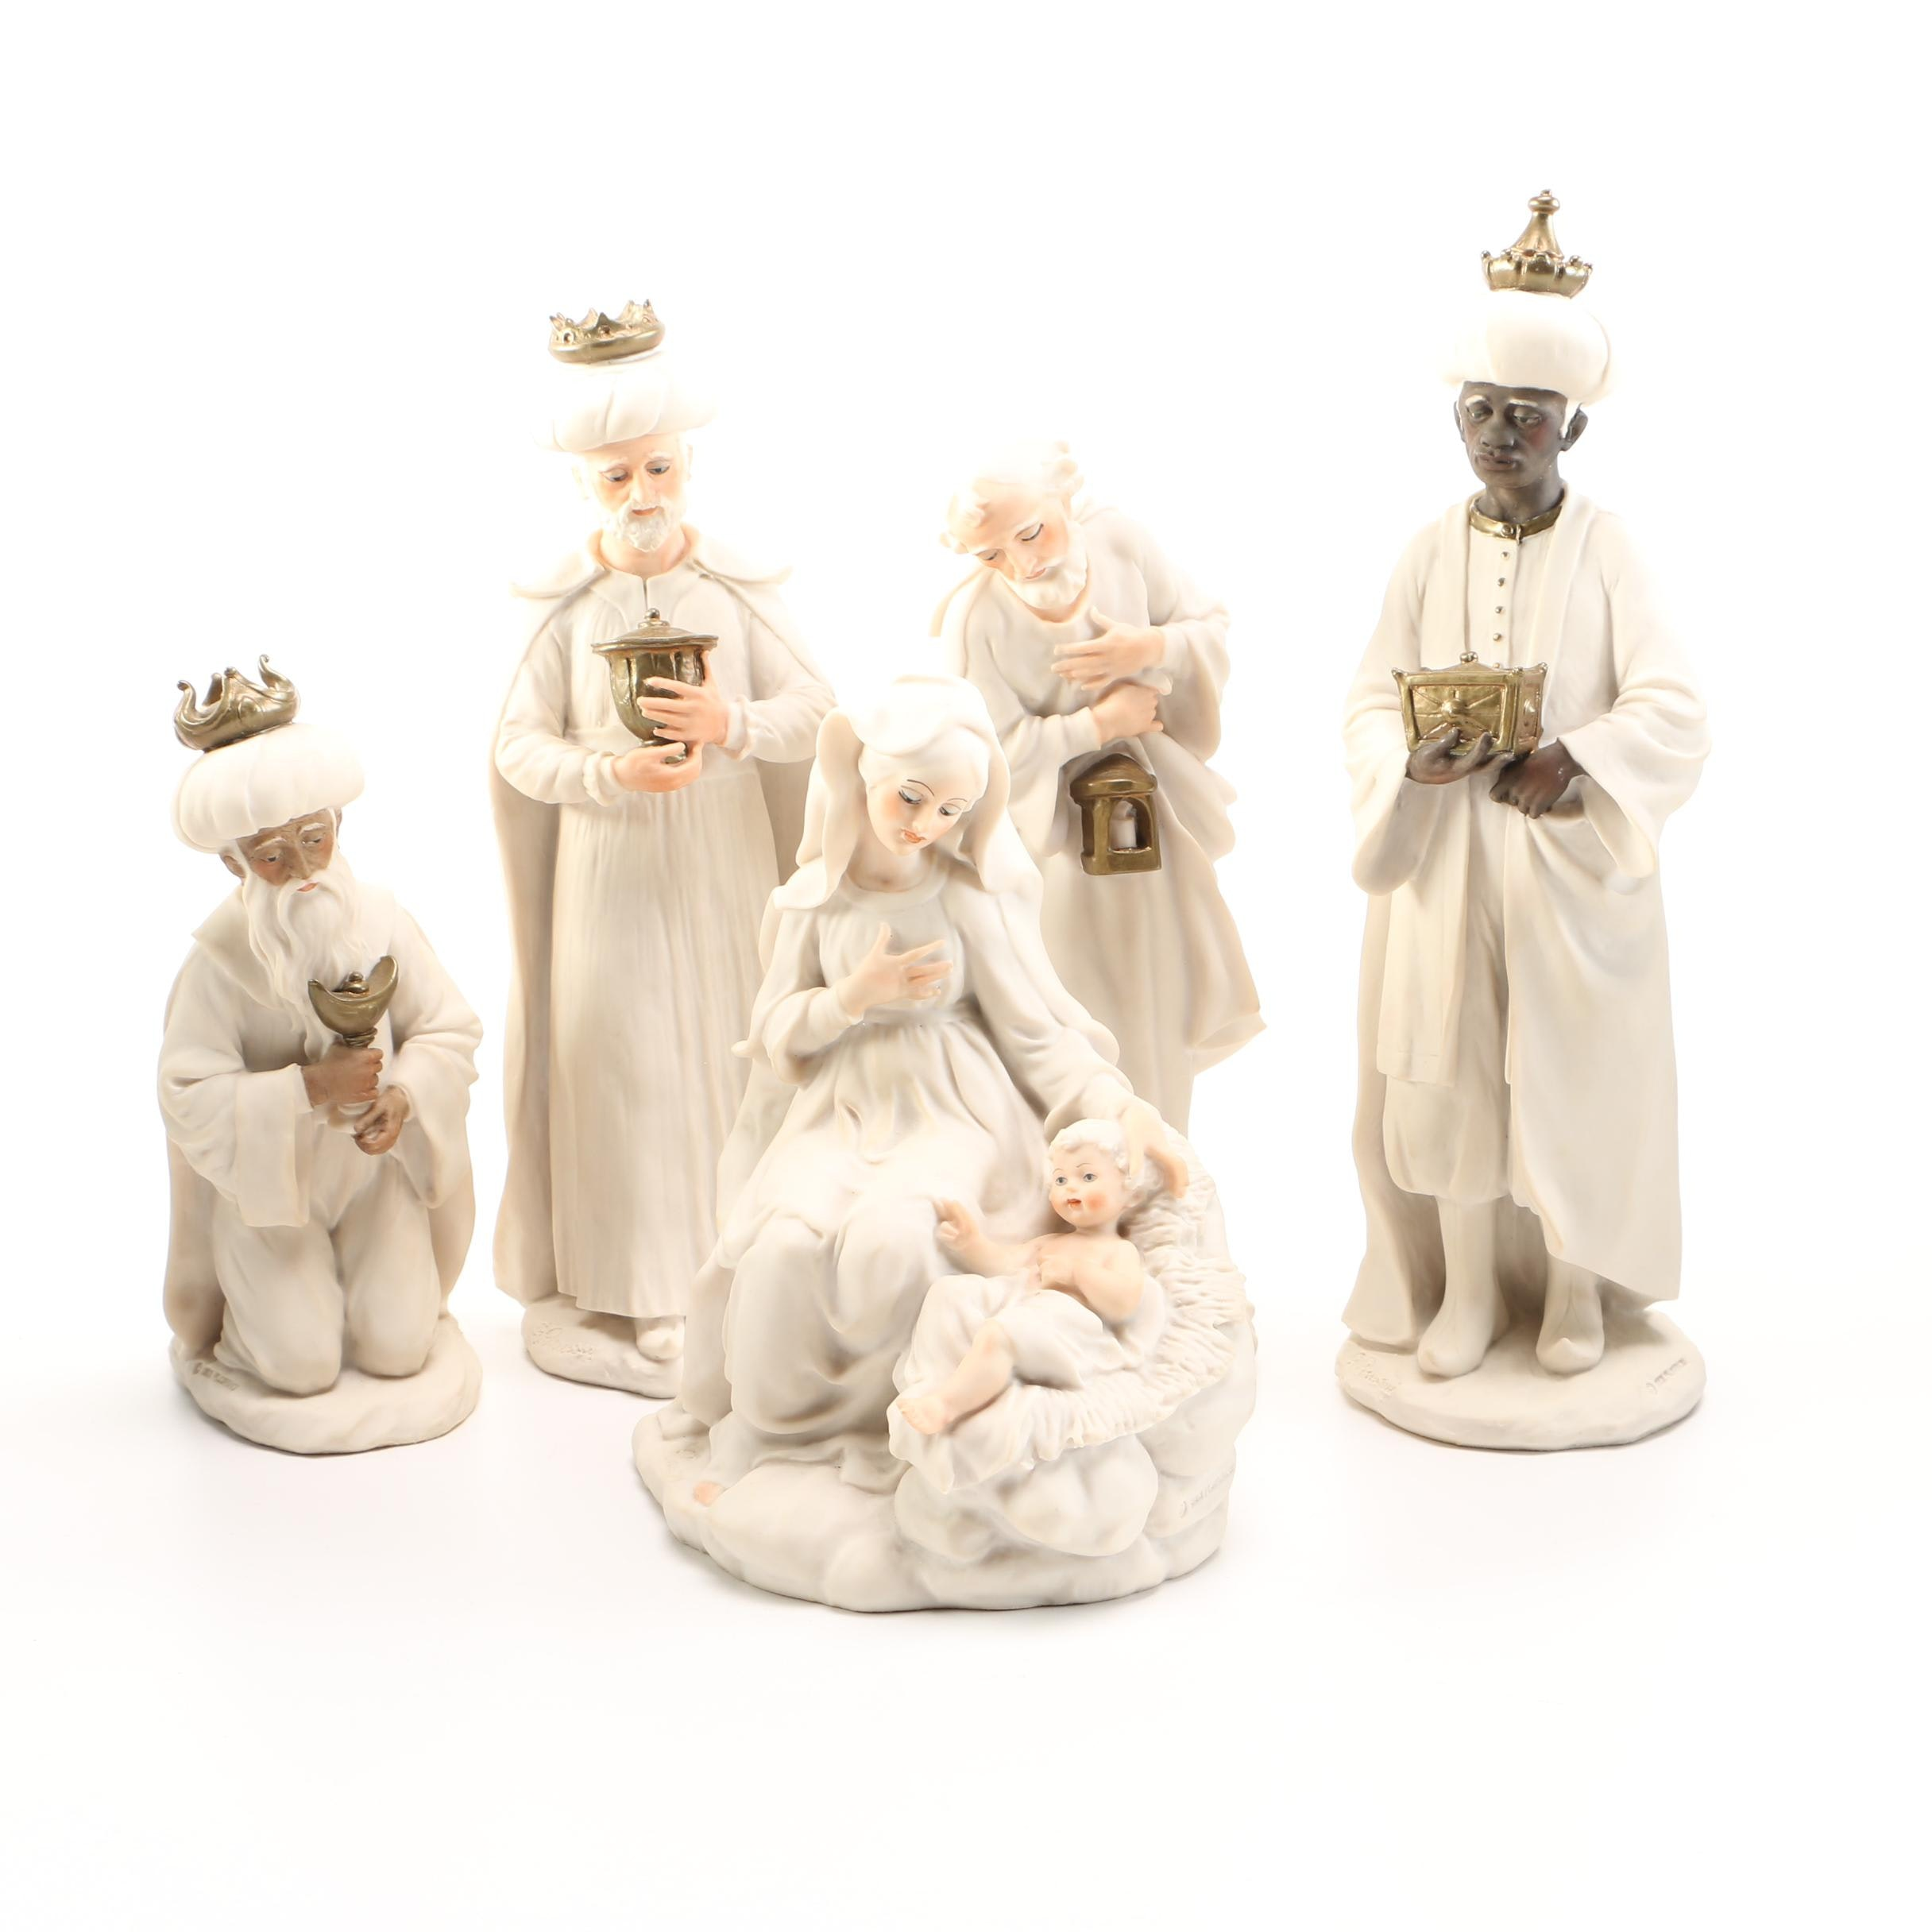 Capodimonte Guiseppe Armani Nativity Figurines